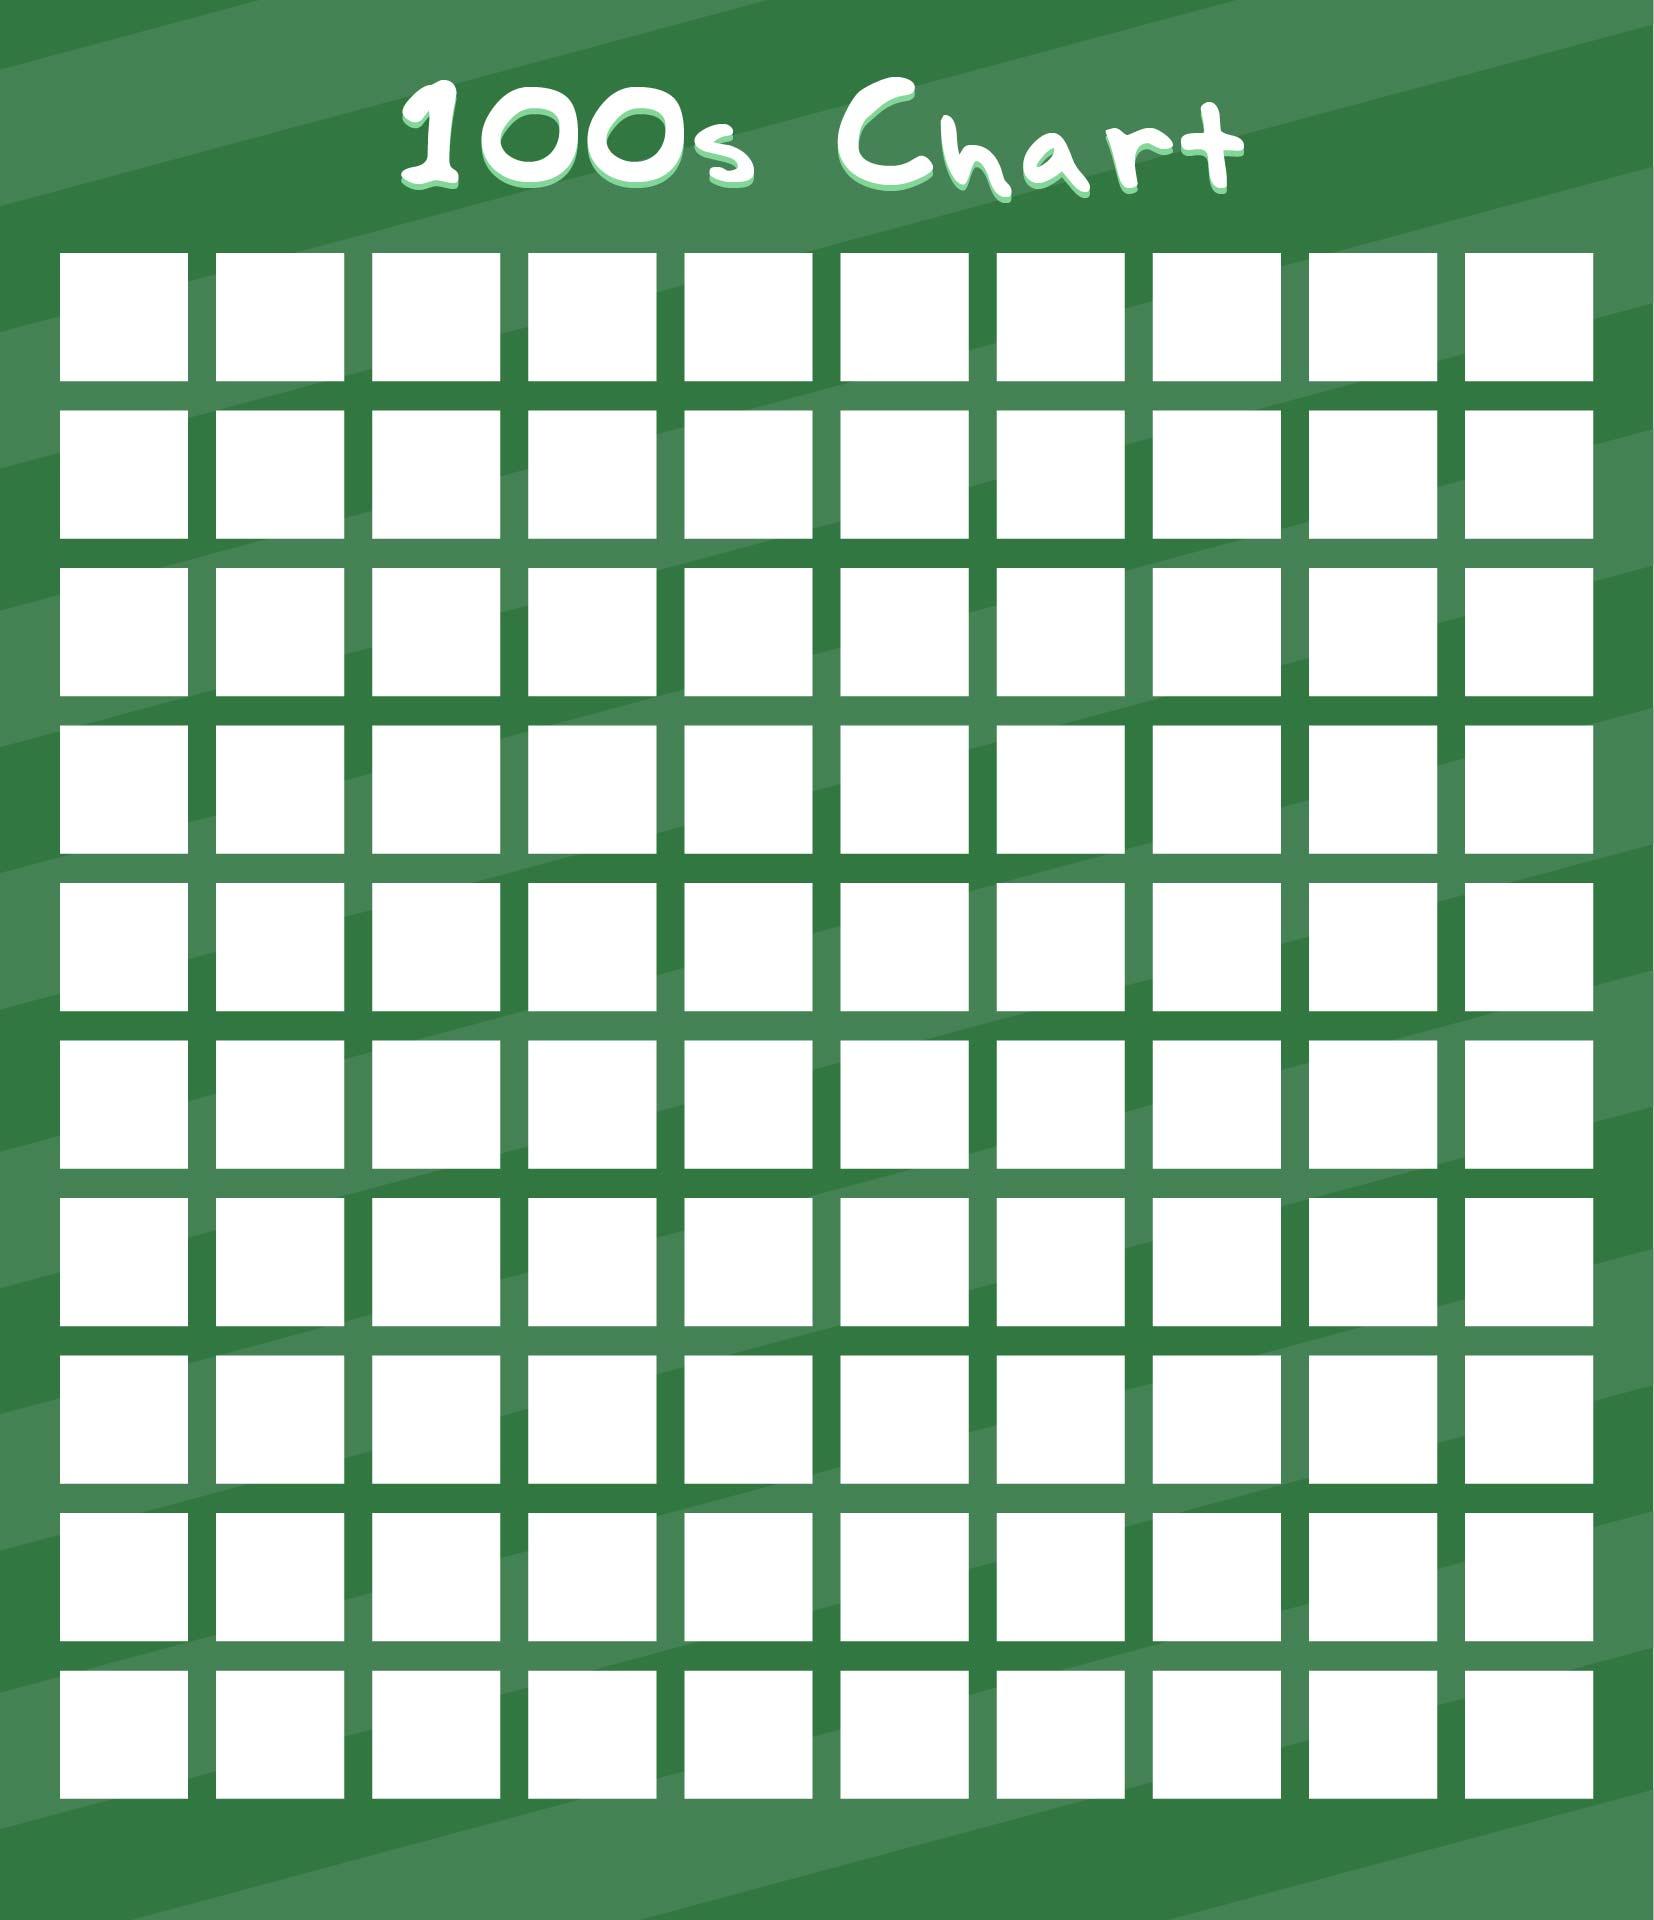 Printable Blank 100 Number Chart